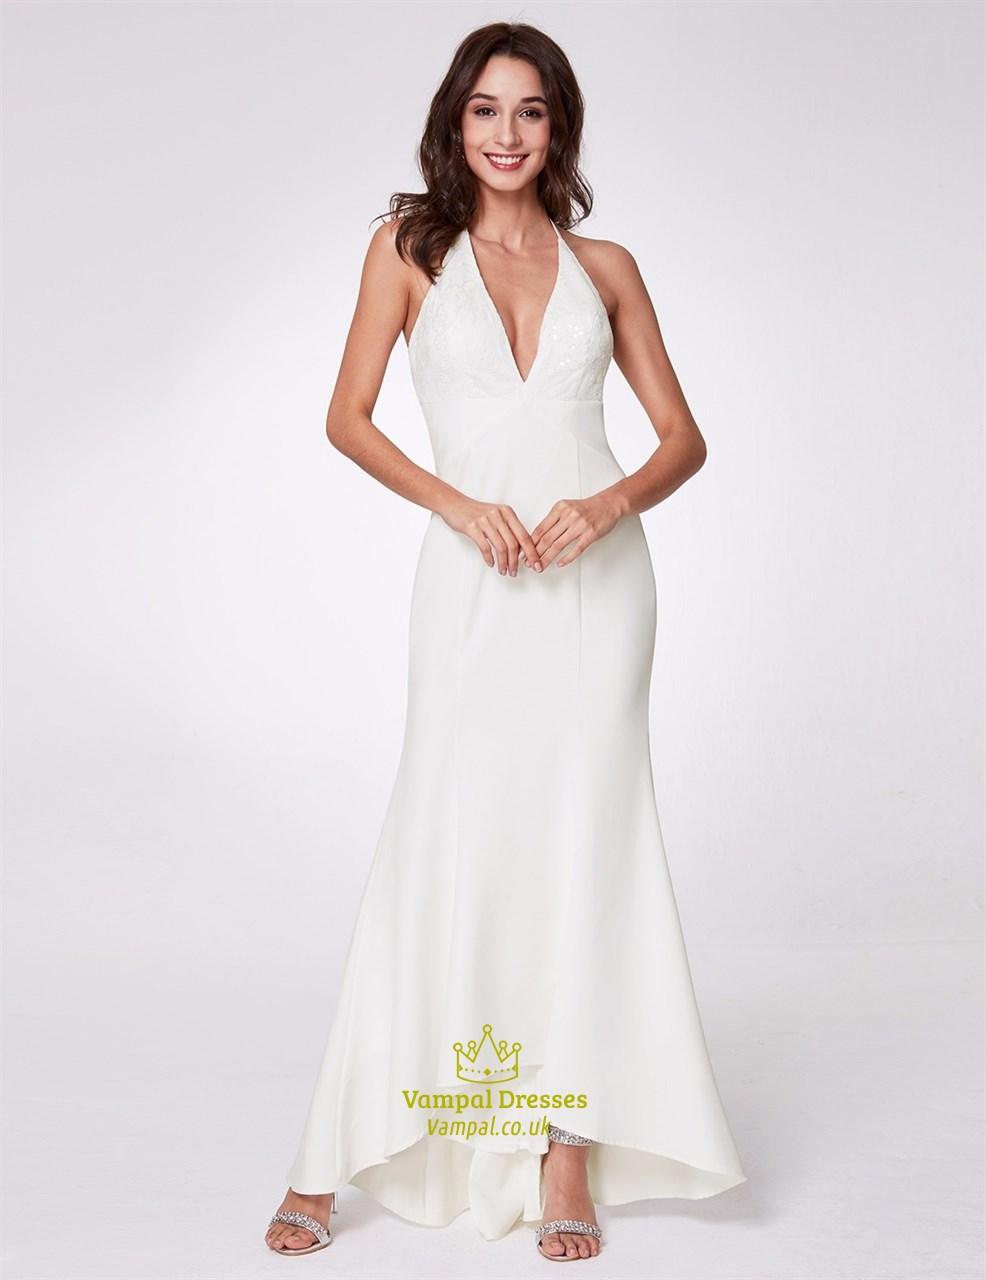 016f125b3190af Halter Neck Sleeveless Asymmetrical Hem Long Prom Dress With Sequins SKU  -C661